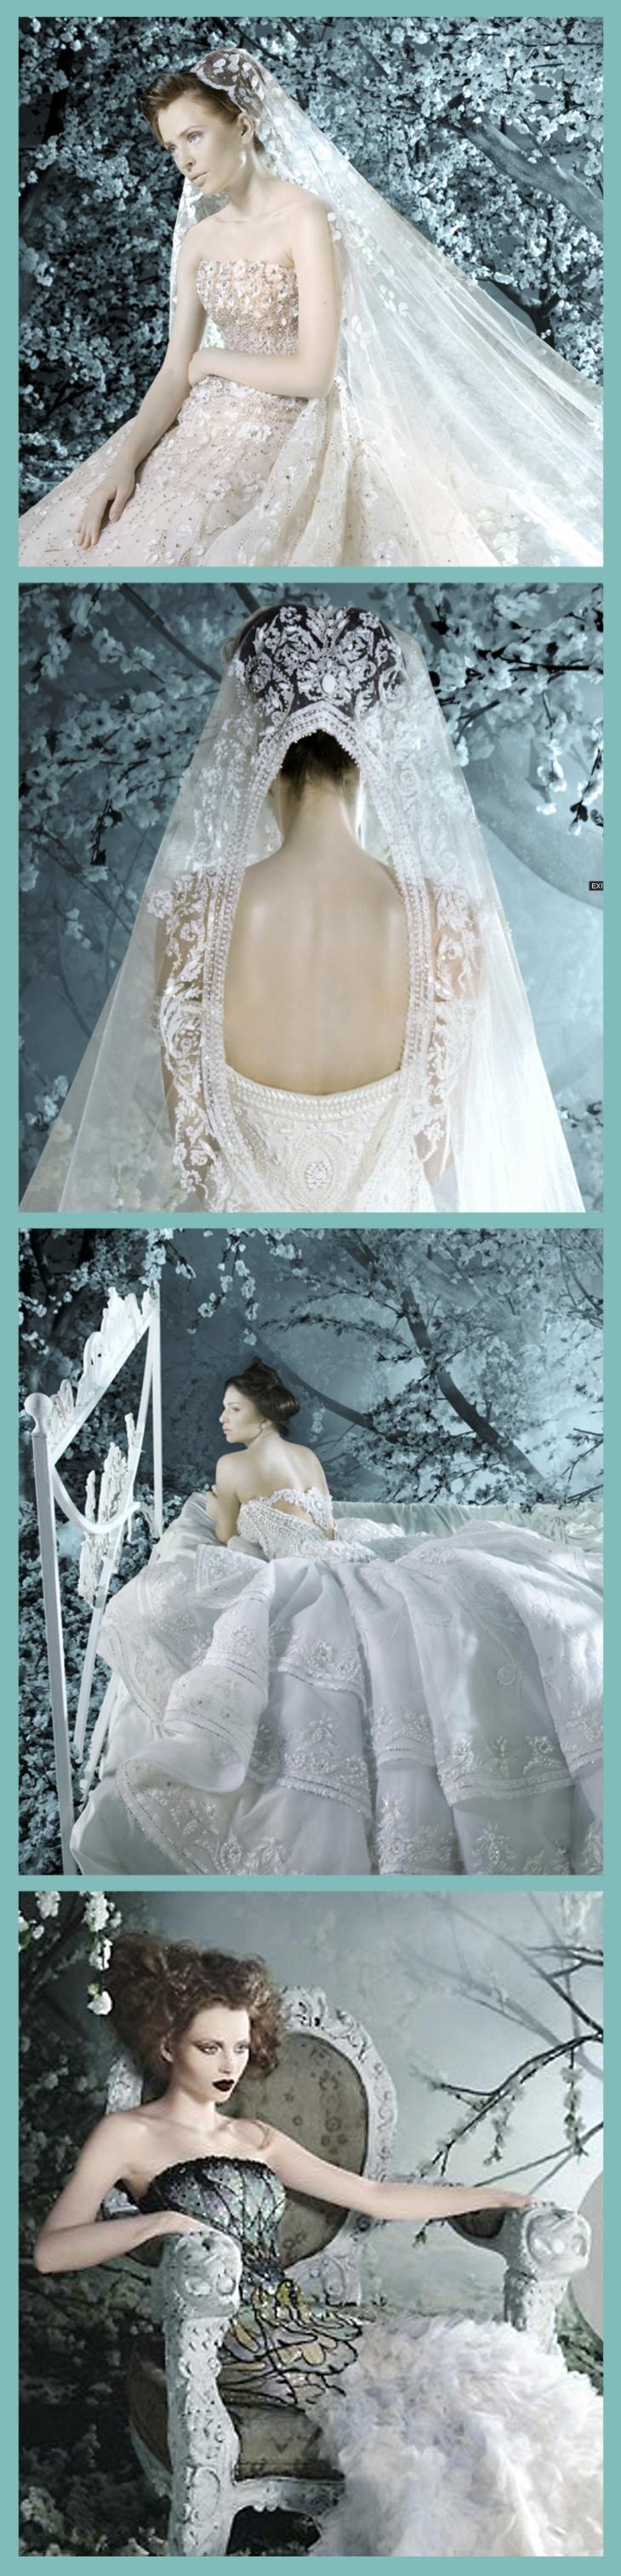 14 best Michael Cinco collection images on Pinterest | Short wedding ...